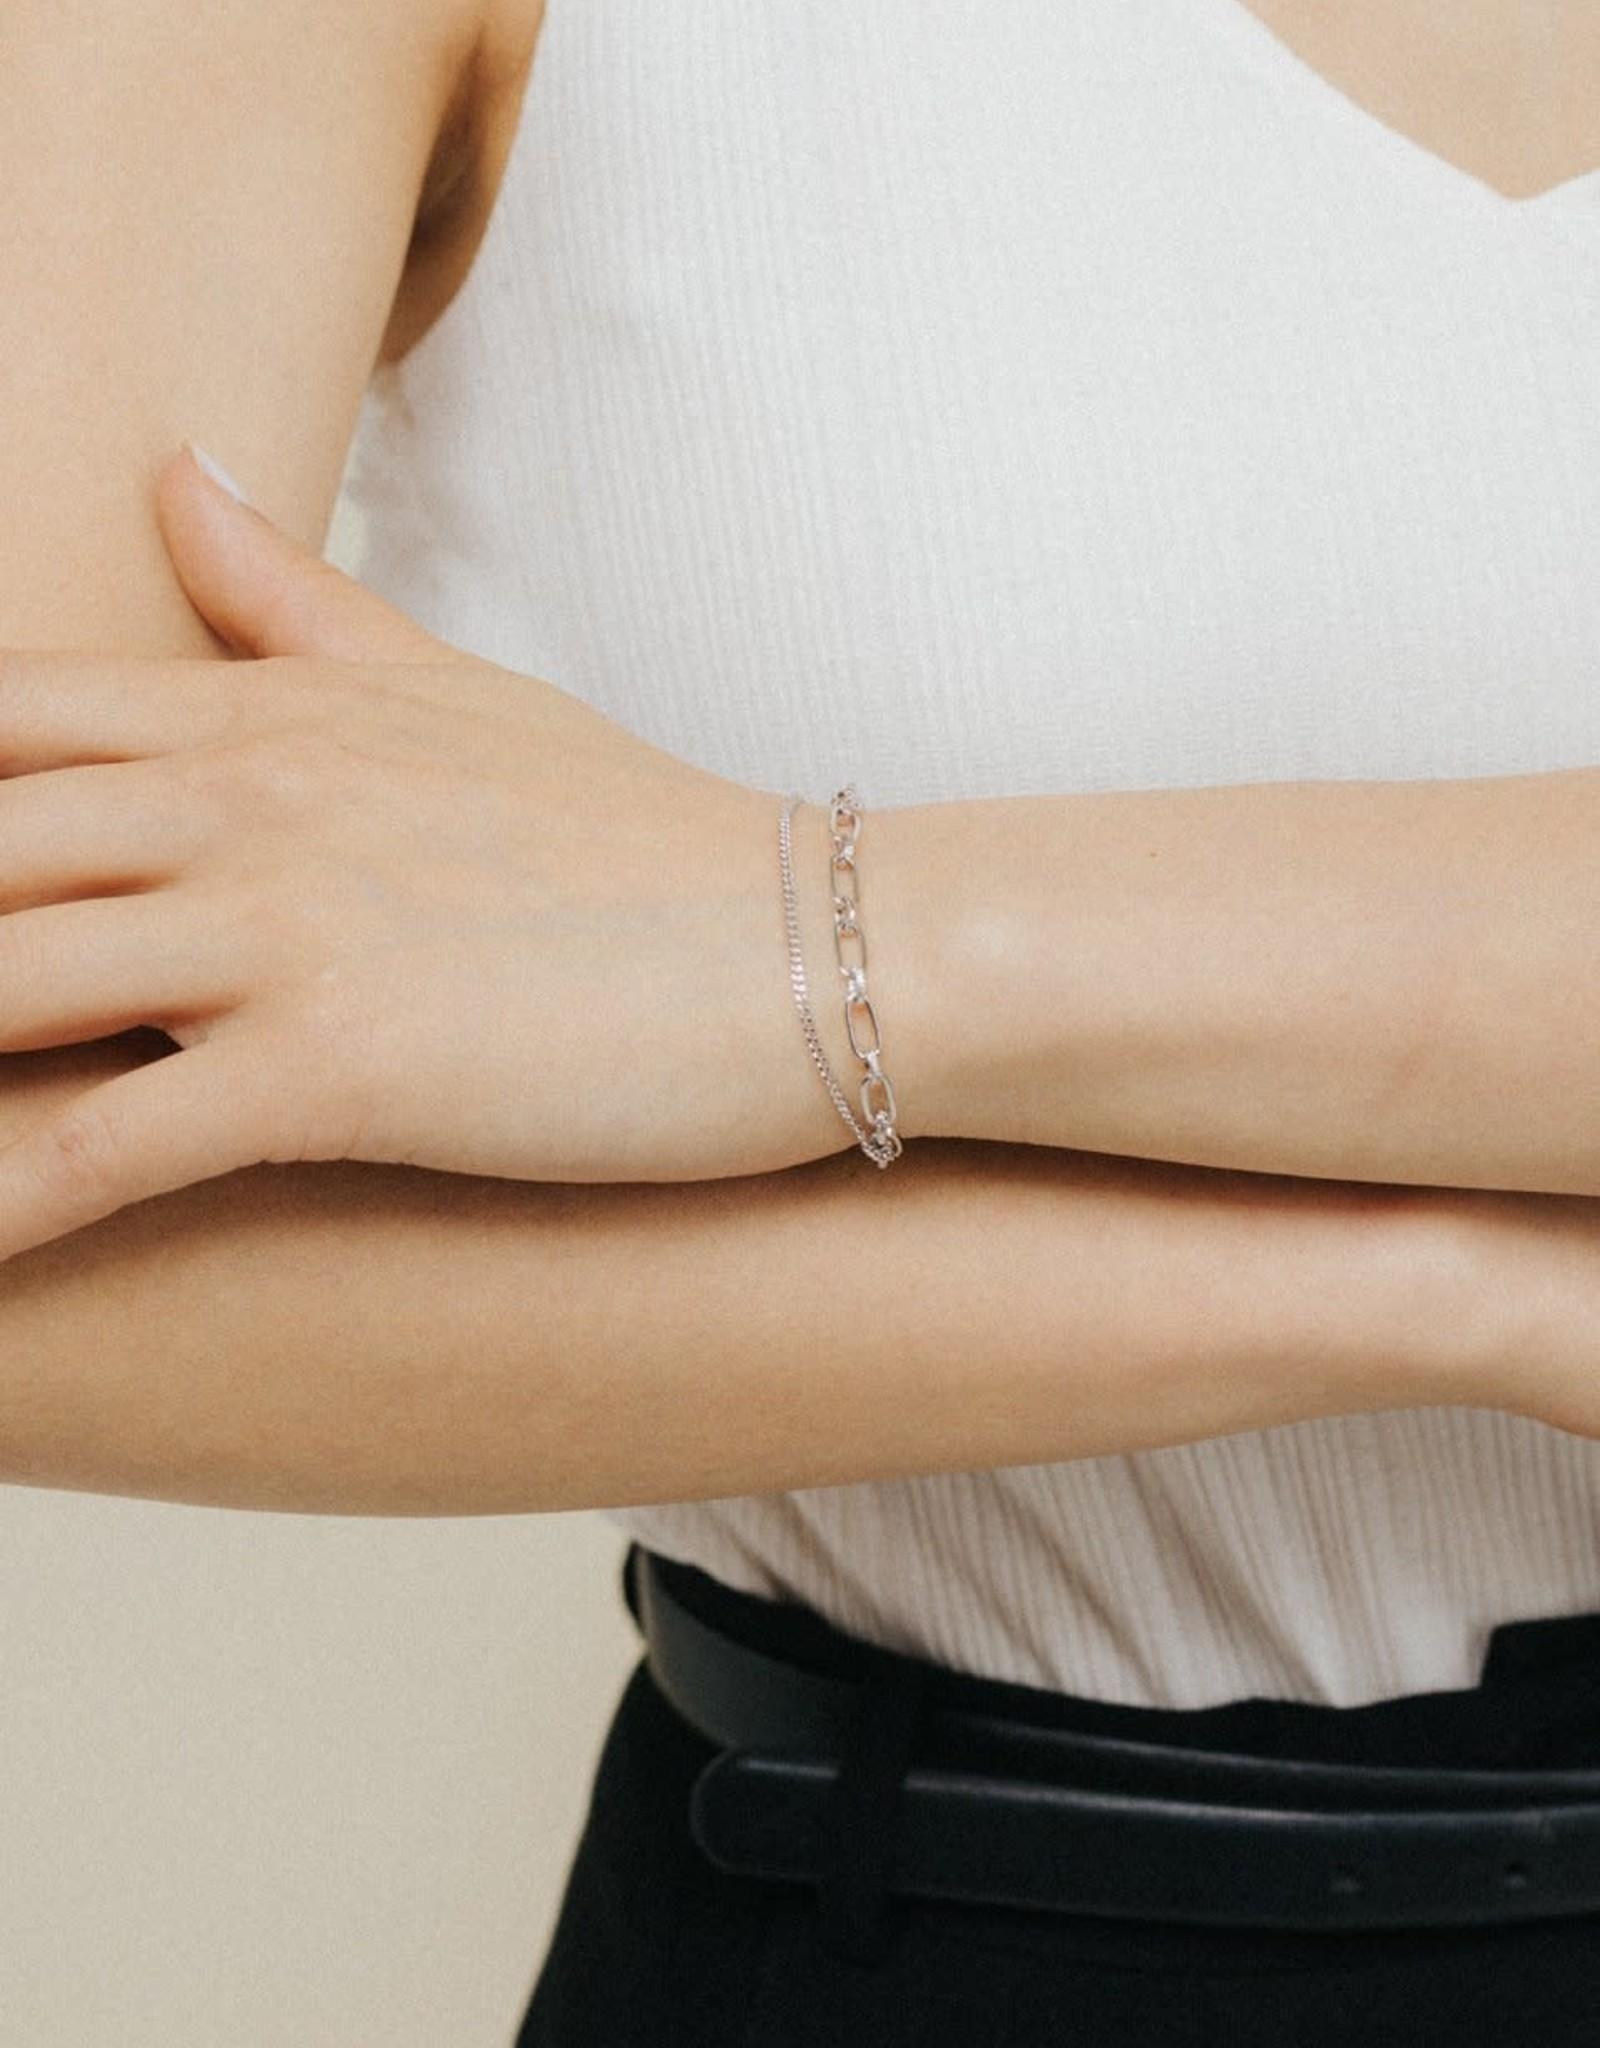 Lover's tempo Bracelet - Aya mailles 2 rangs